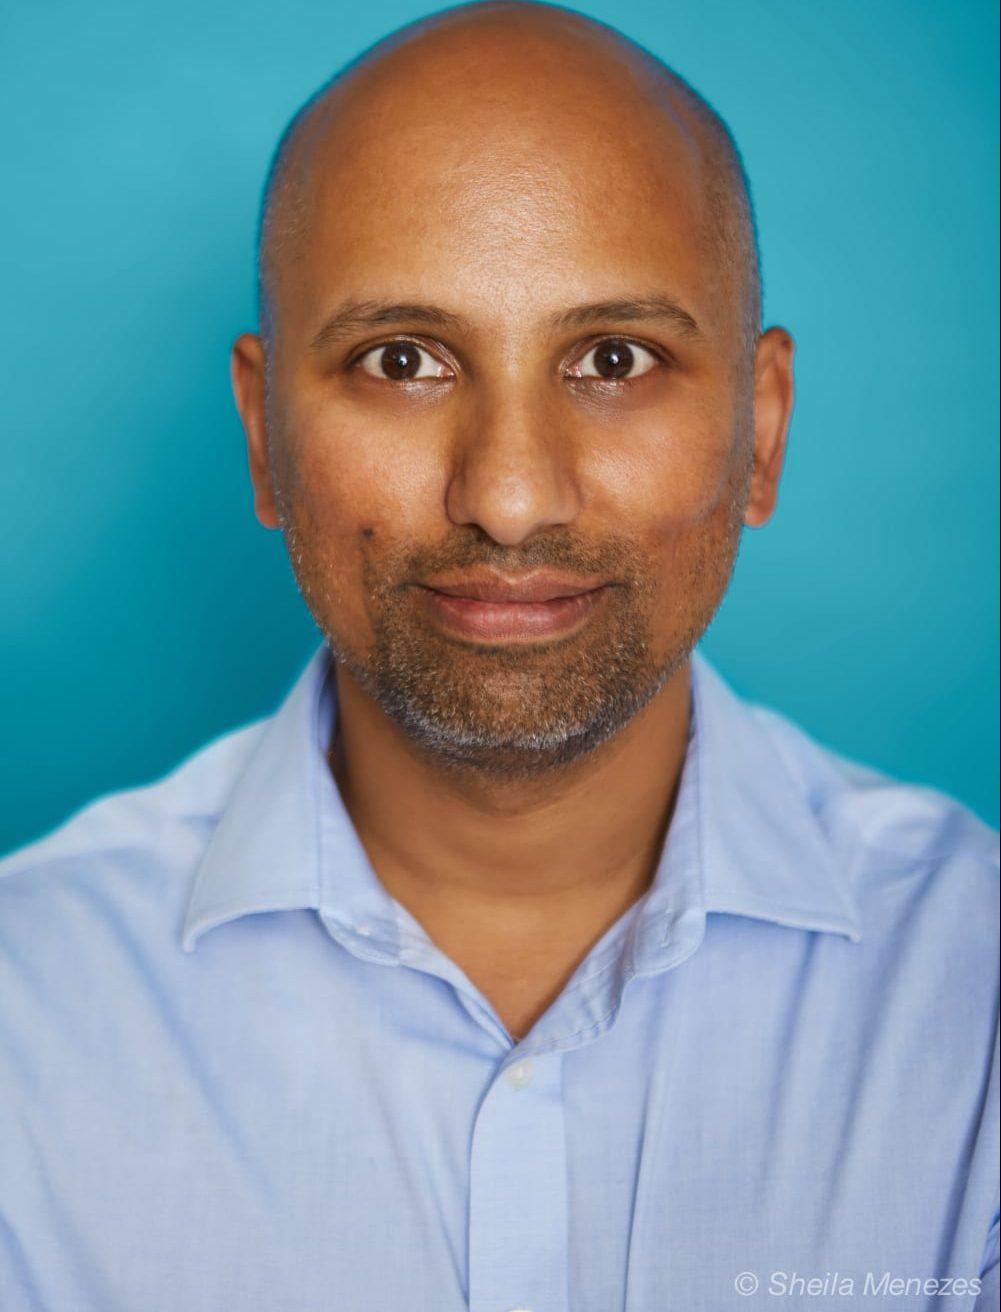 Sriram Shamasunder, MD, DTM&H